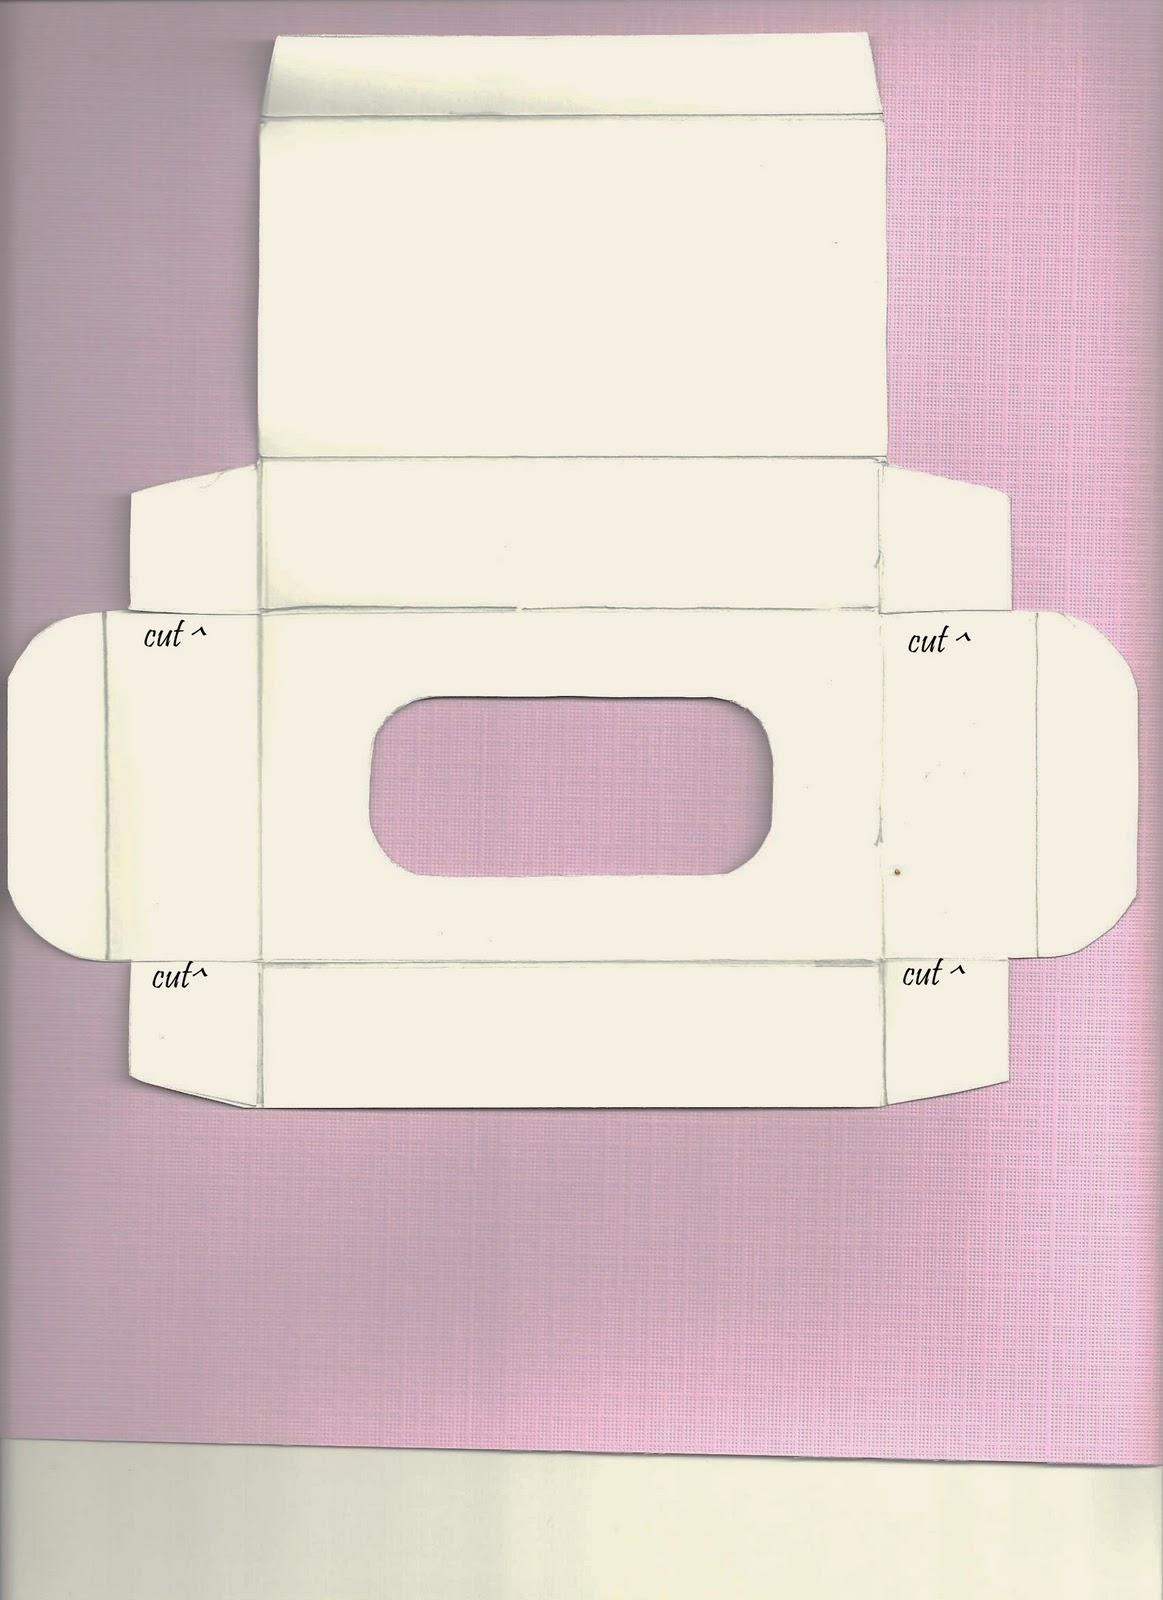 a creative operation kleenex pocket pack box template. Black Bedroom Furniture Sets. Home Design Ideas